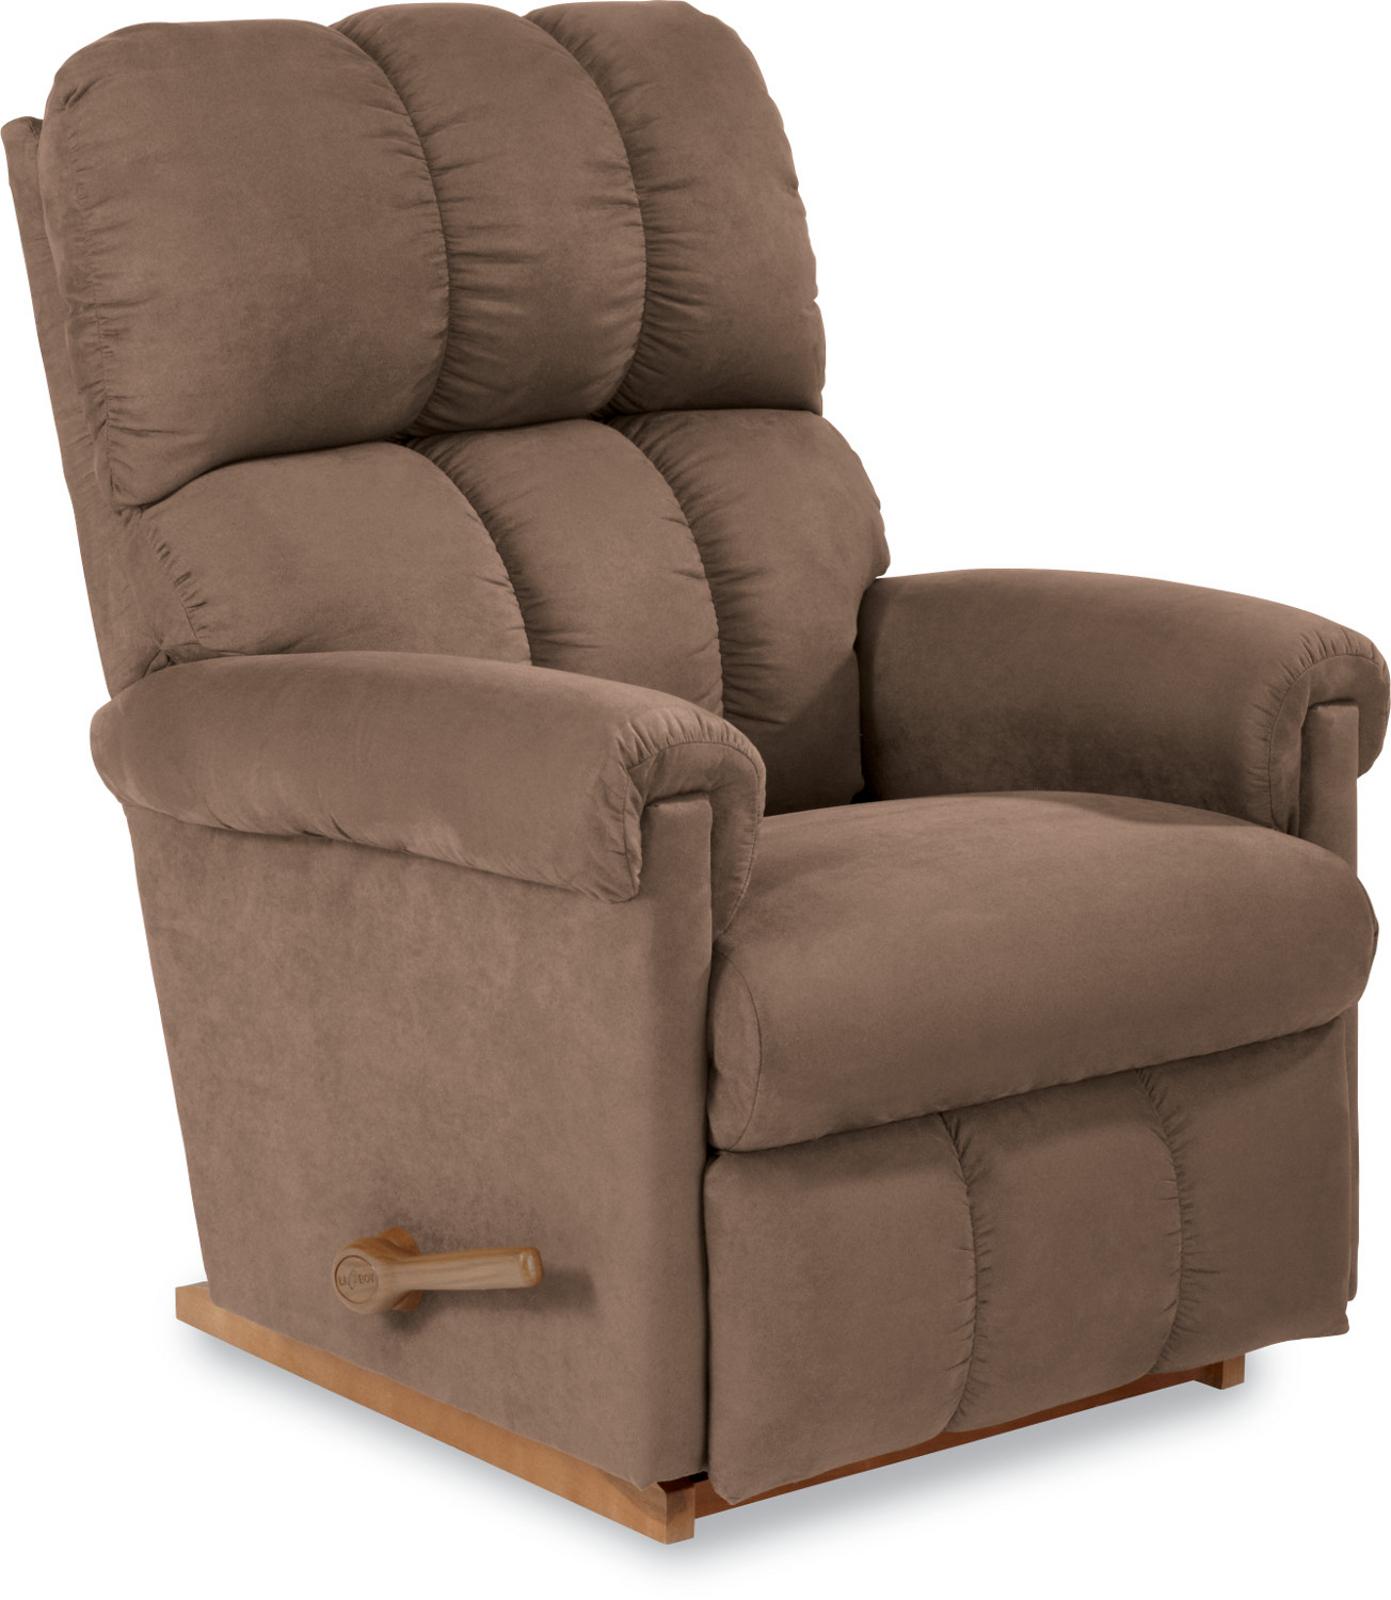 lazy boy reclining sofa warranty ashley furniture alenya charcoal la z 010403 aspen reclina rocker brown sears outlet